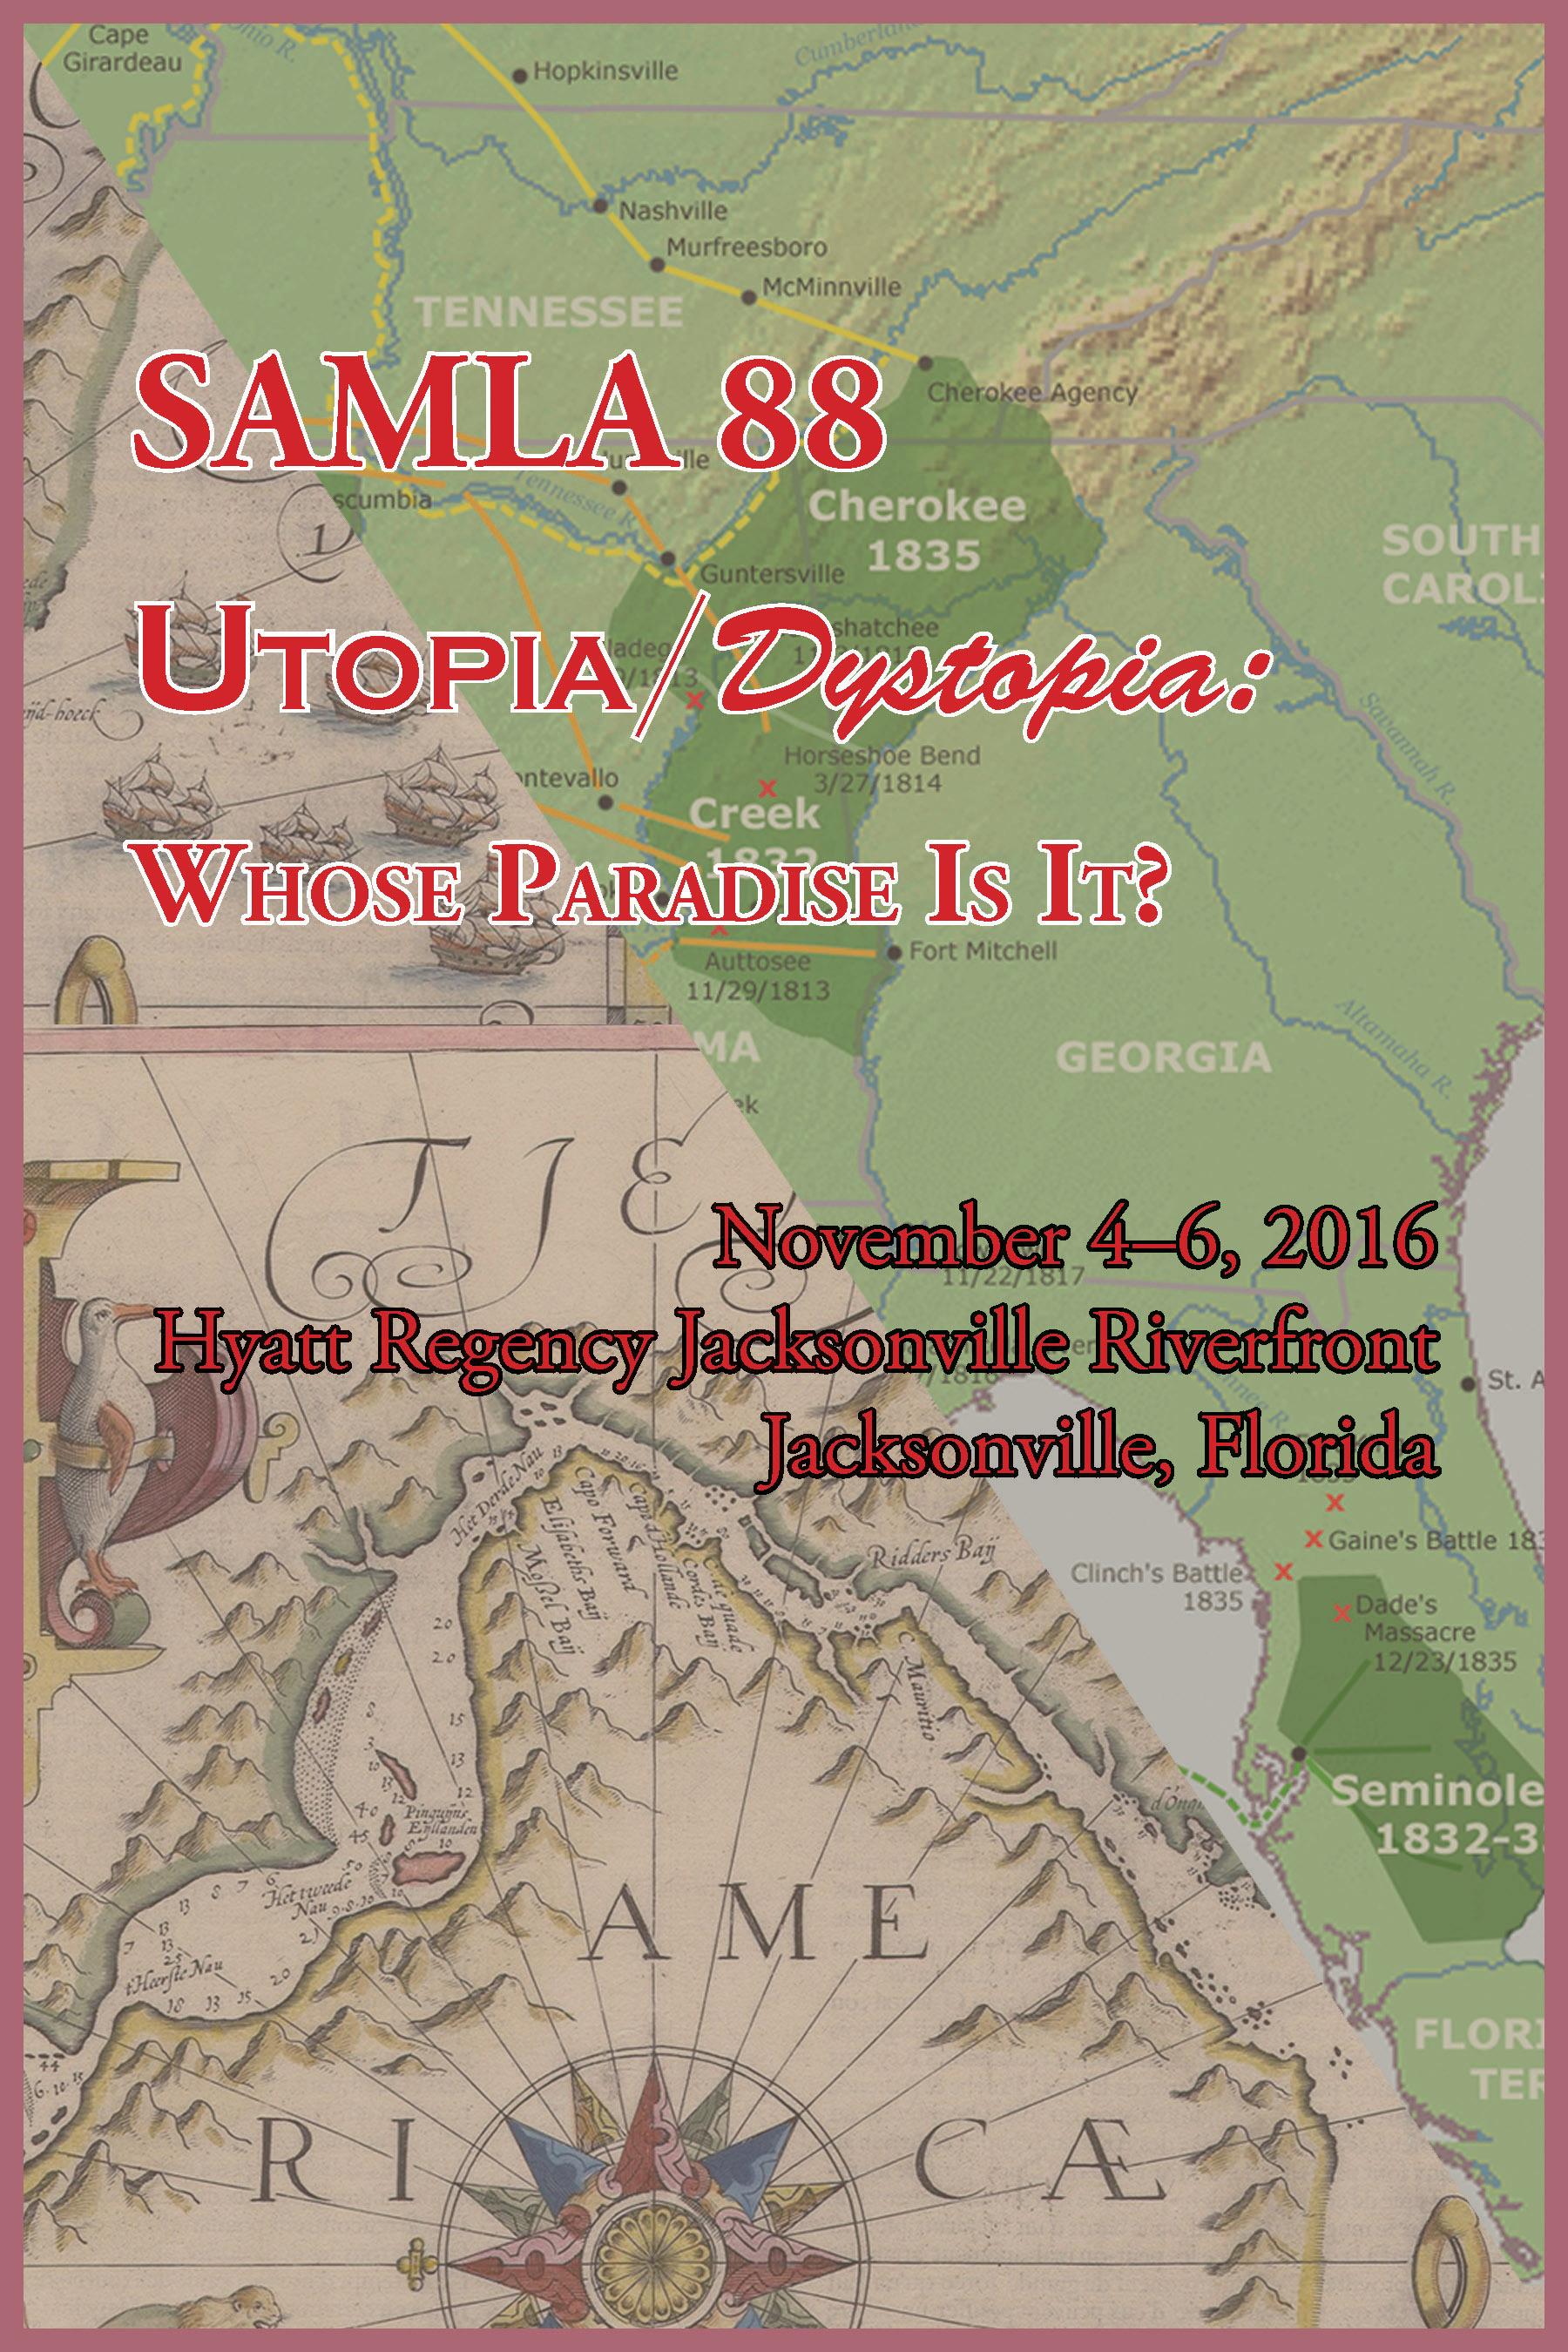 SAMLA 88 Program Cover